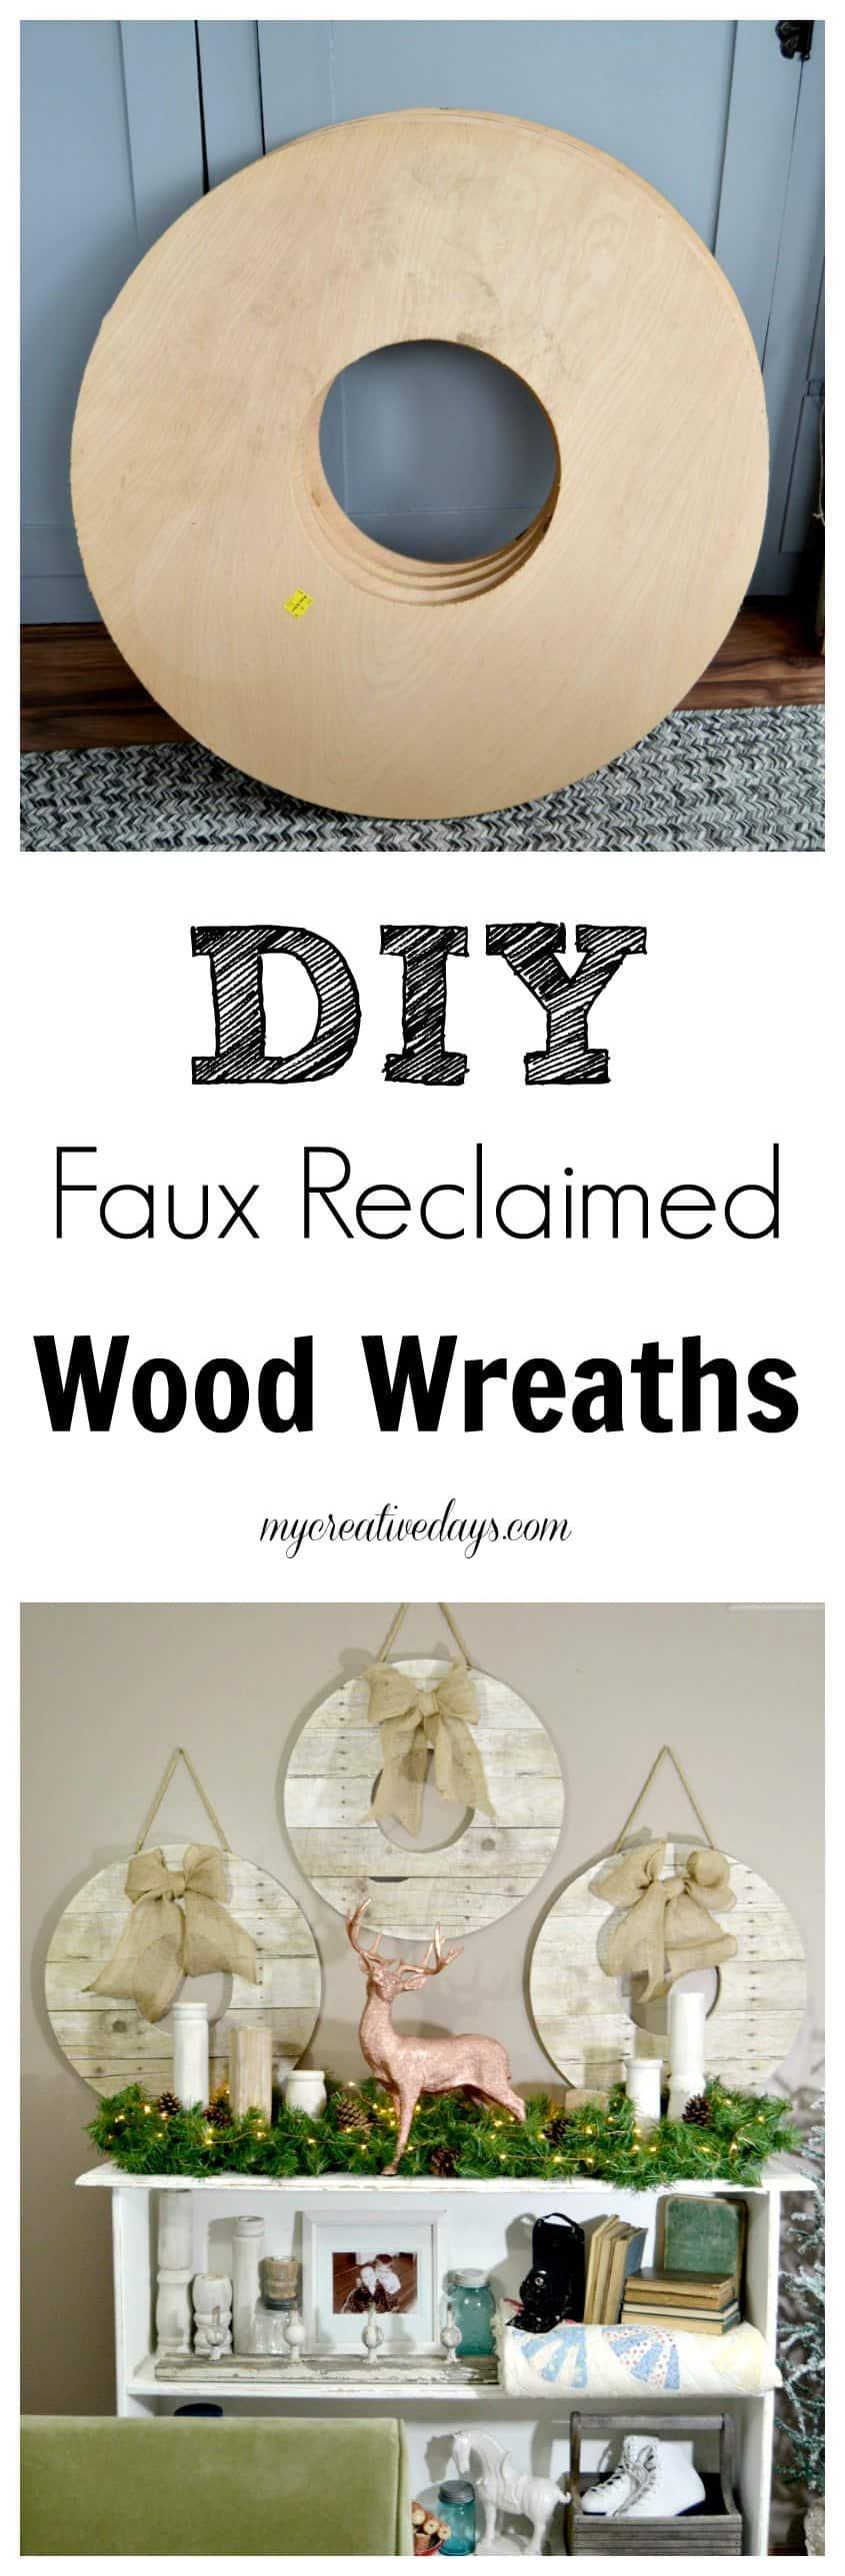 Pin this · DIY Faux Reclaimed Wood Wreaths - DIY Faux Reclaimed Wood Wreaths - My Creative Days